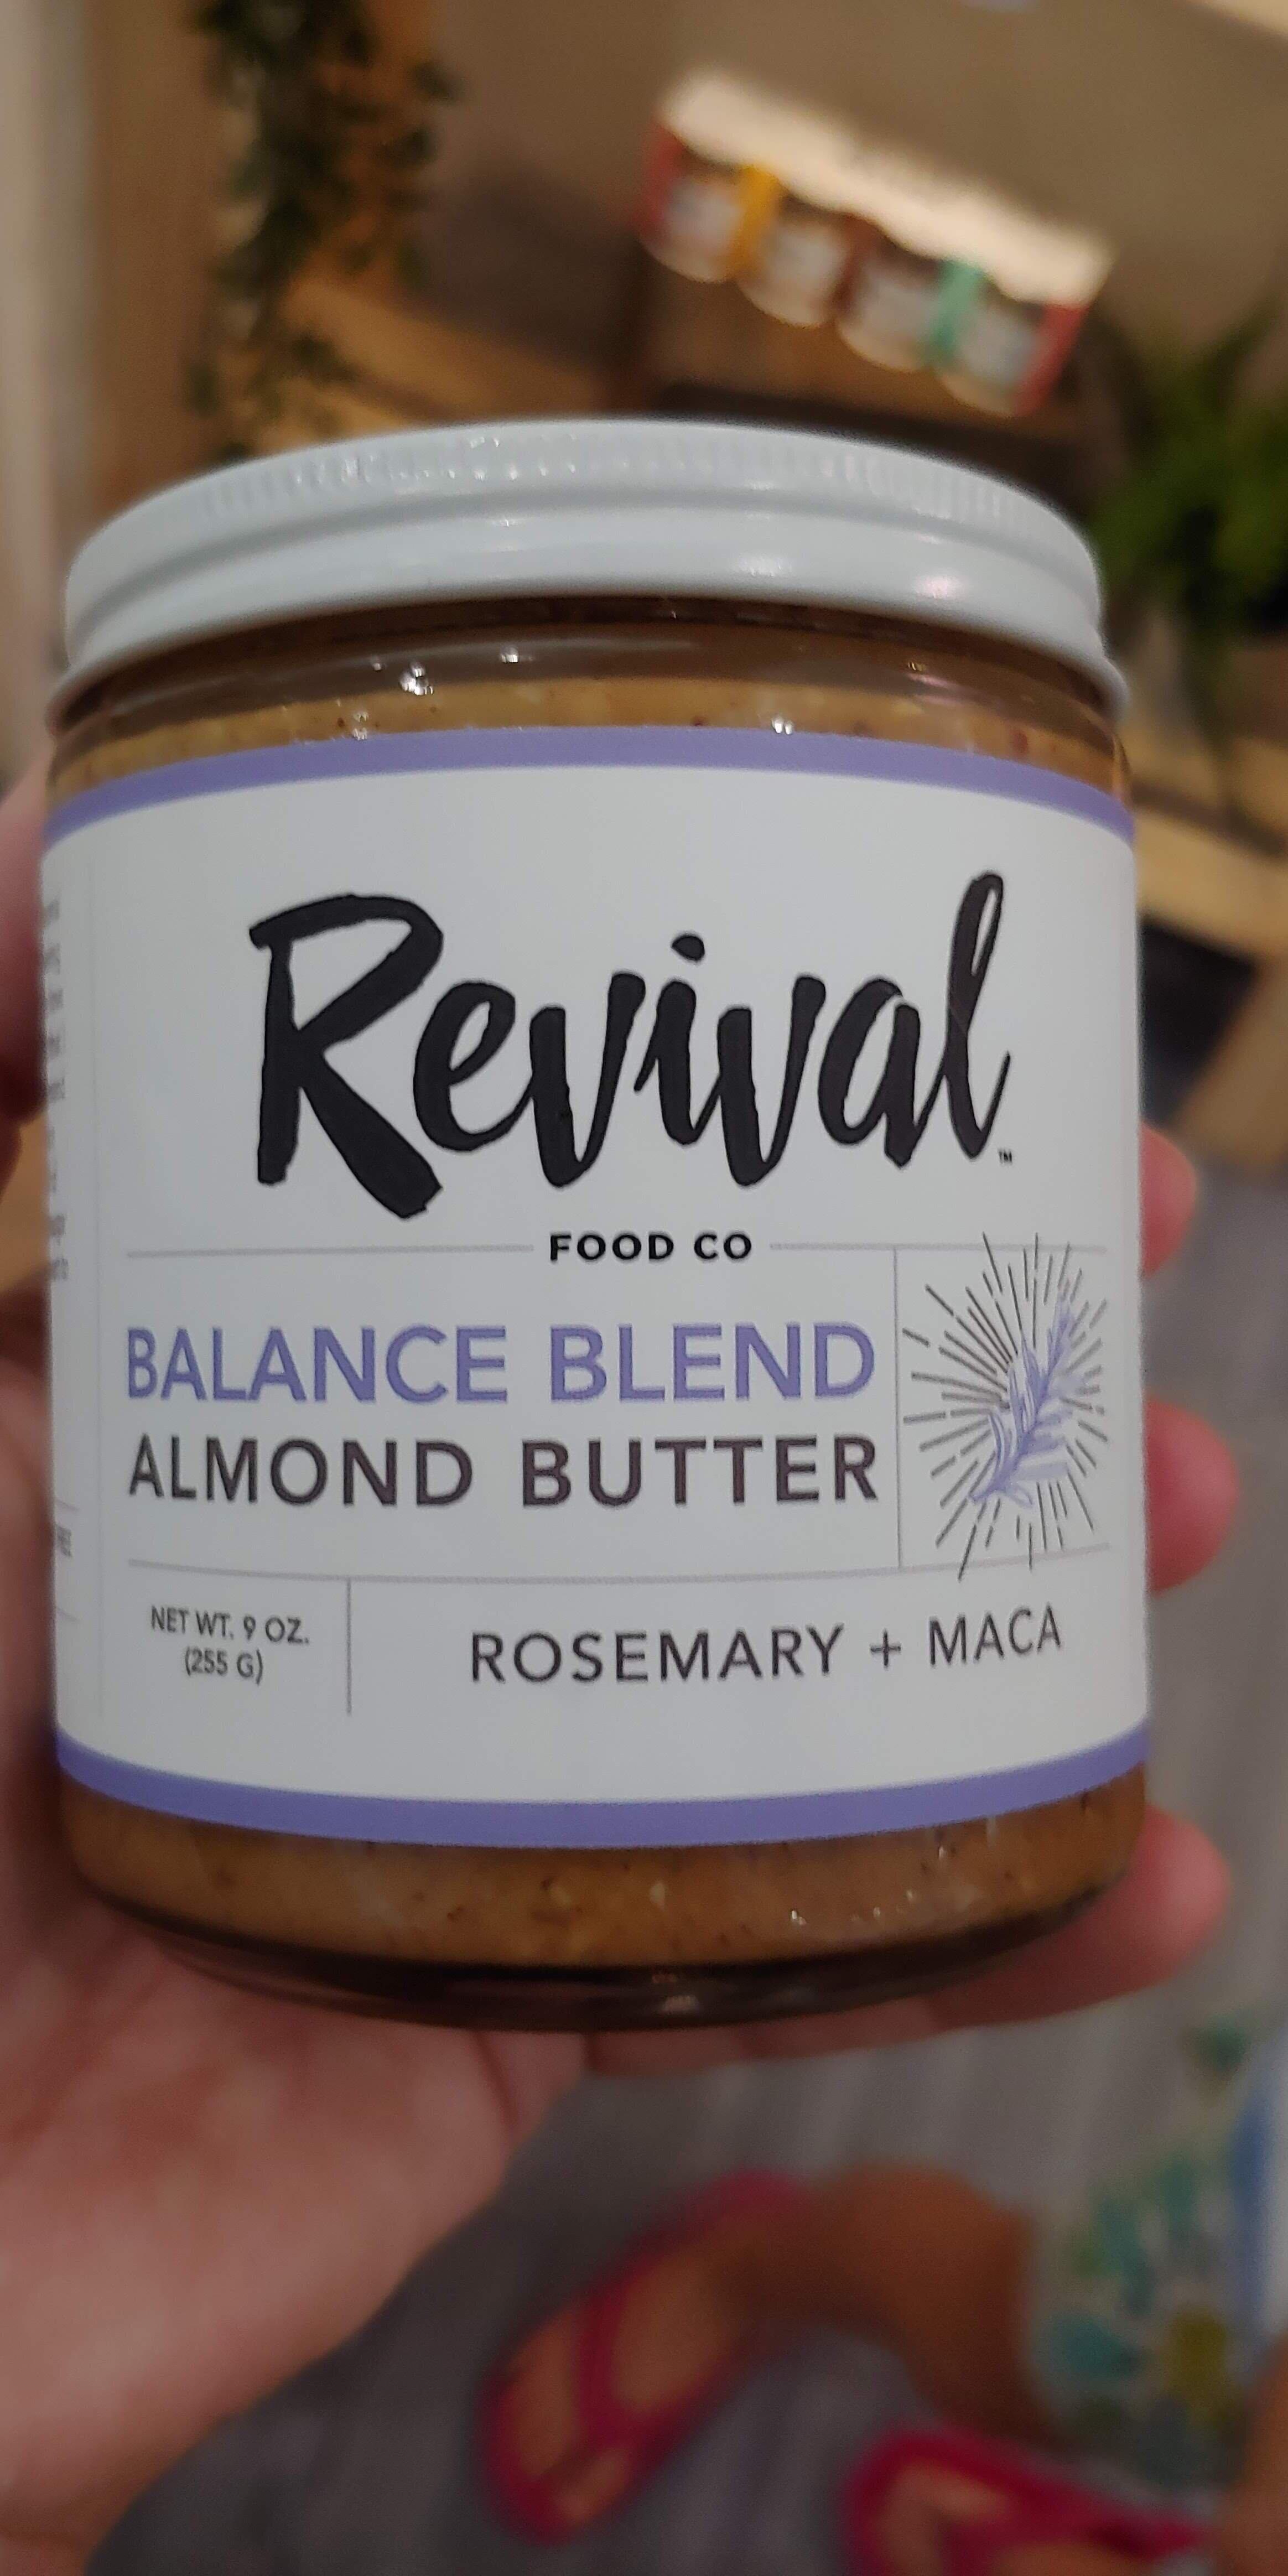 Savory rosemary almond butter YUM